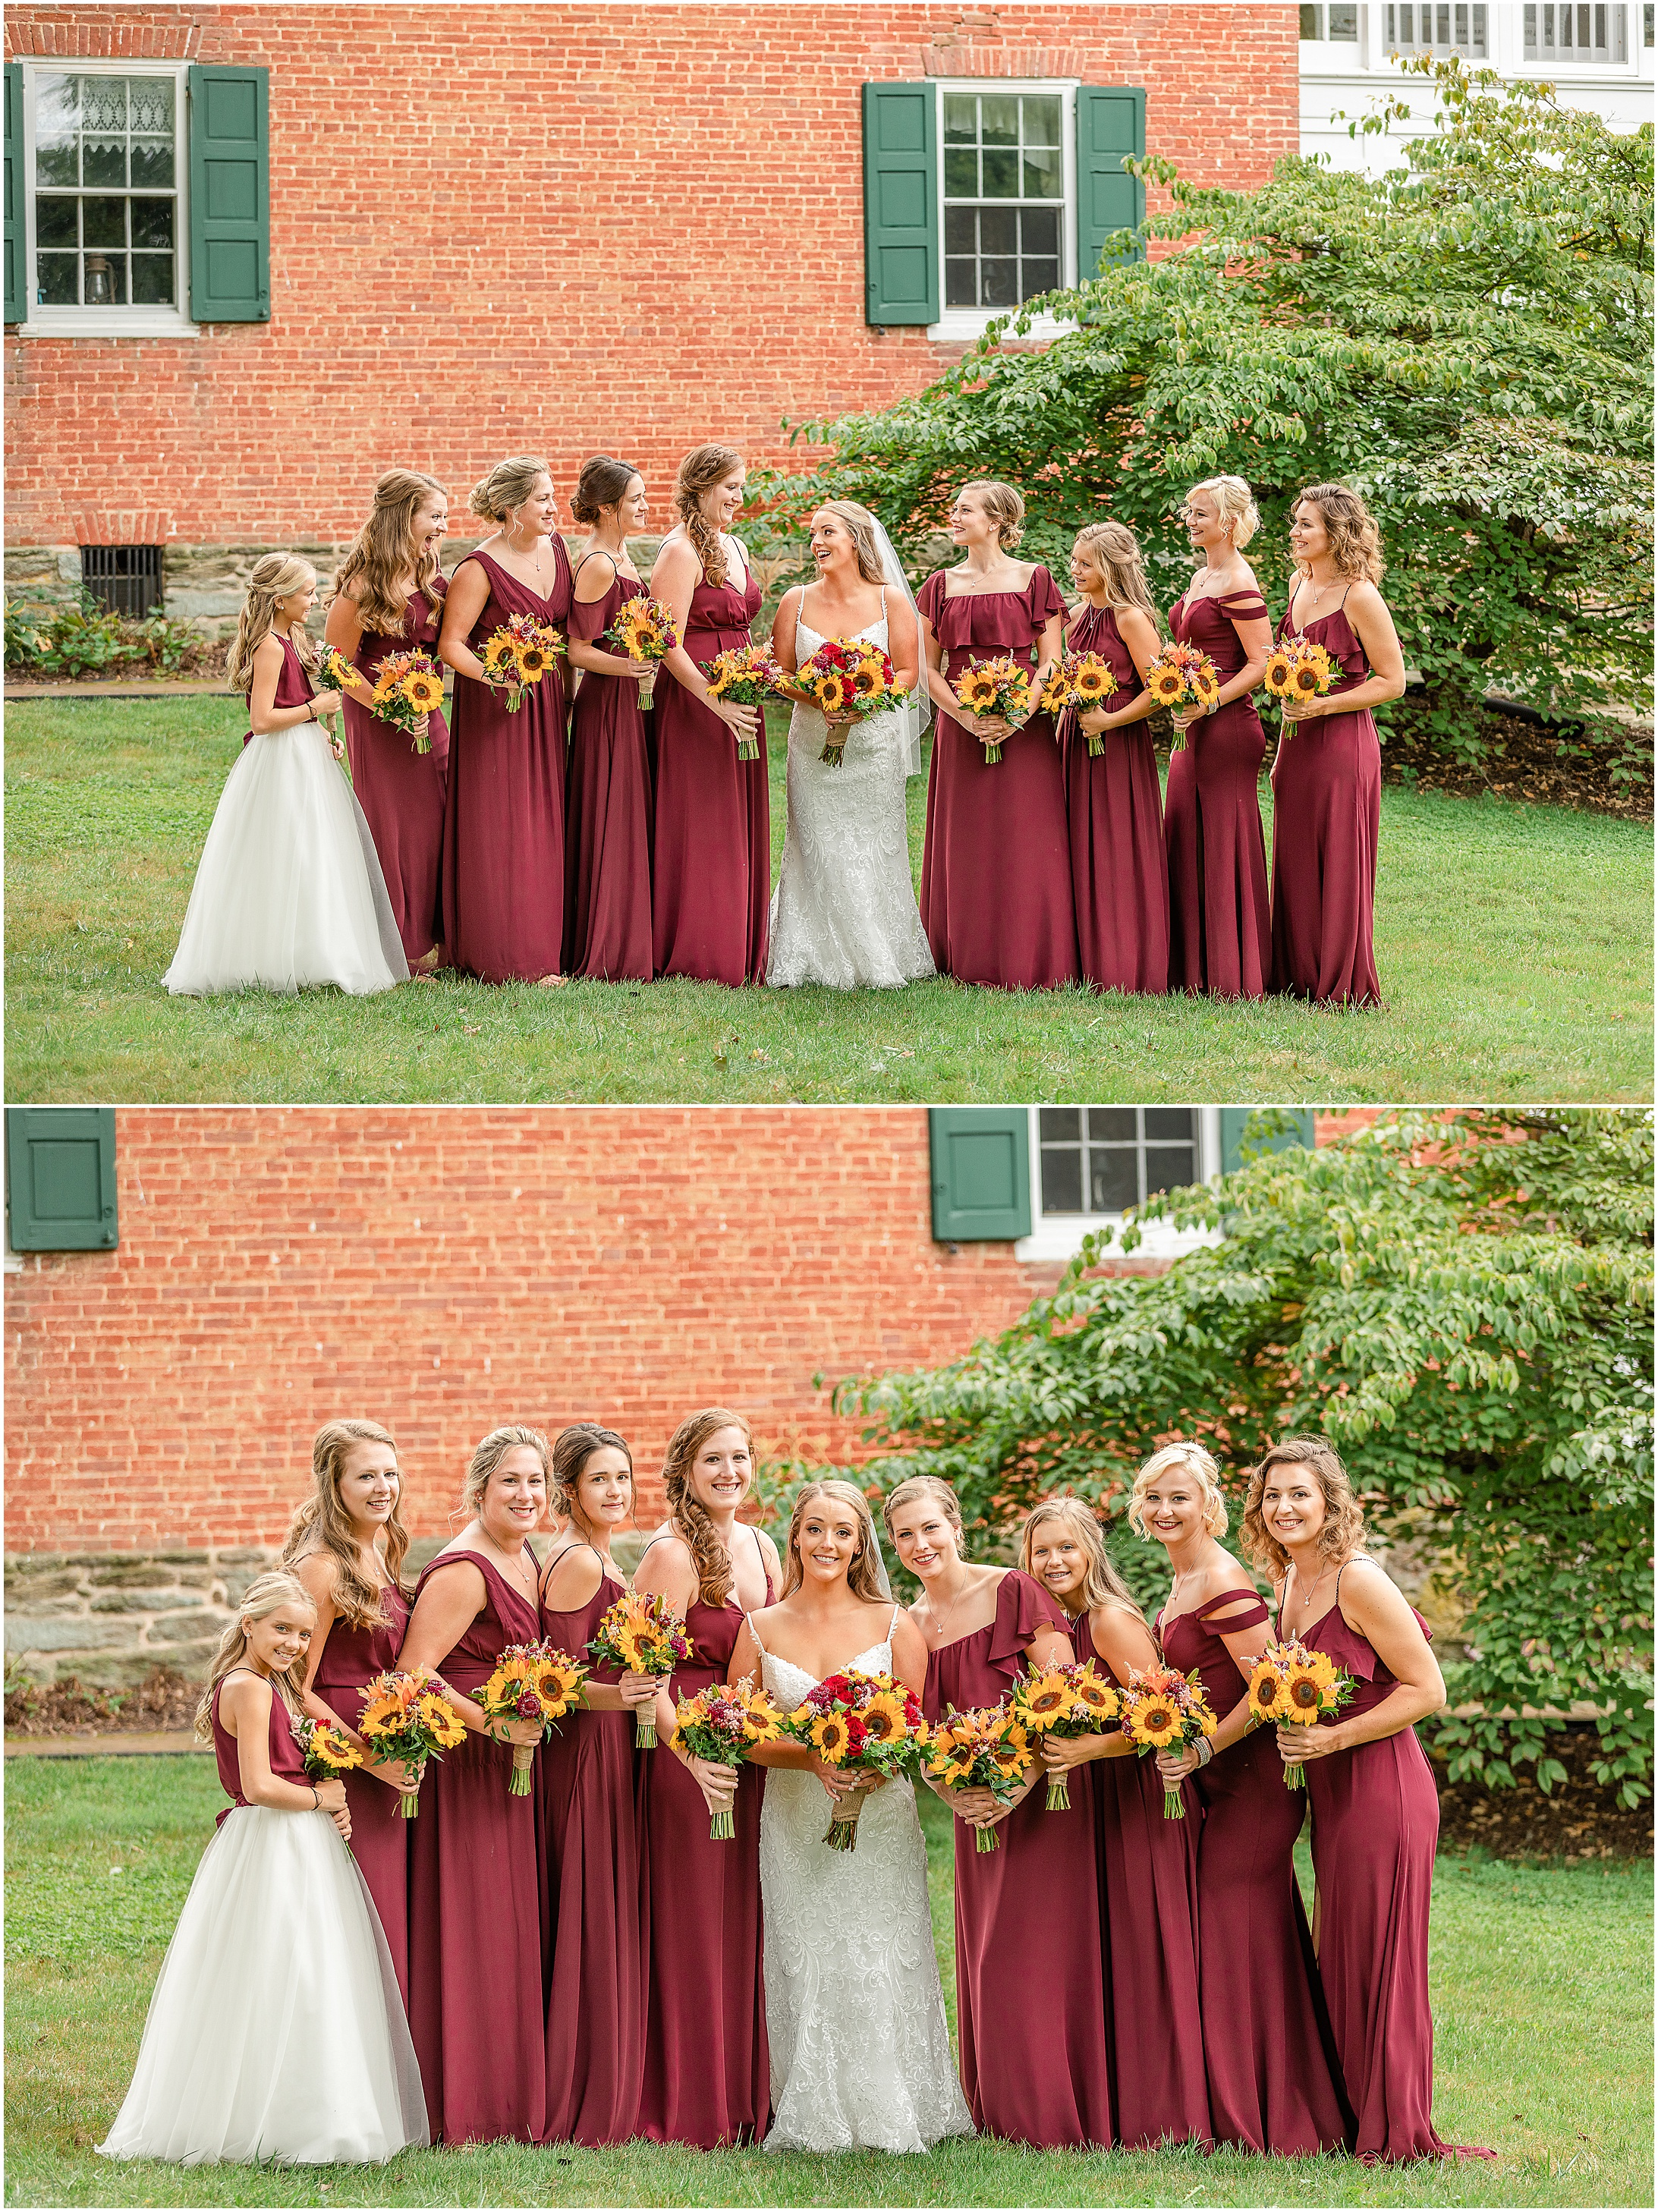 Christian-Royer-House-Wedding-Photos_0551.jpg